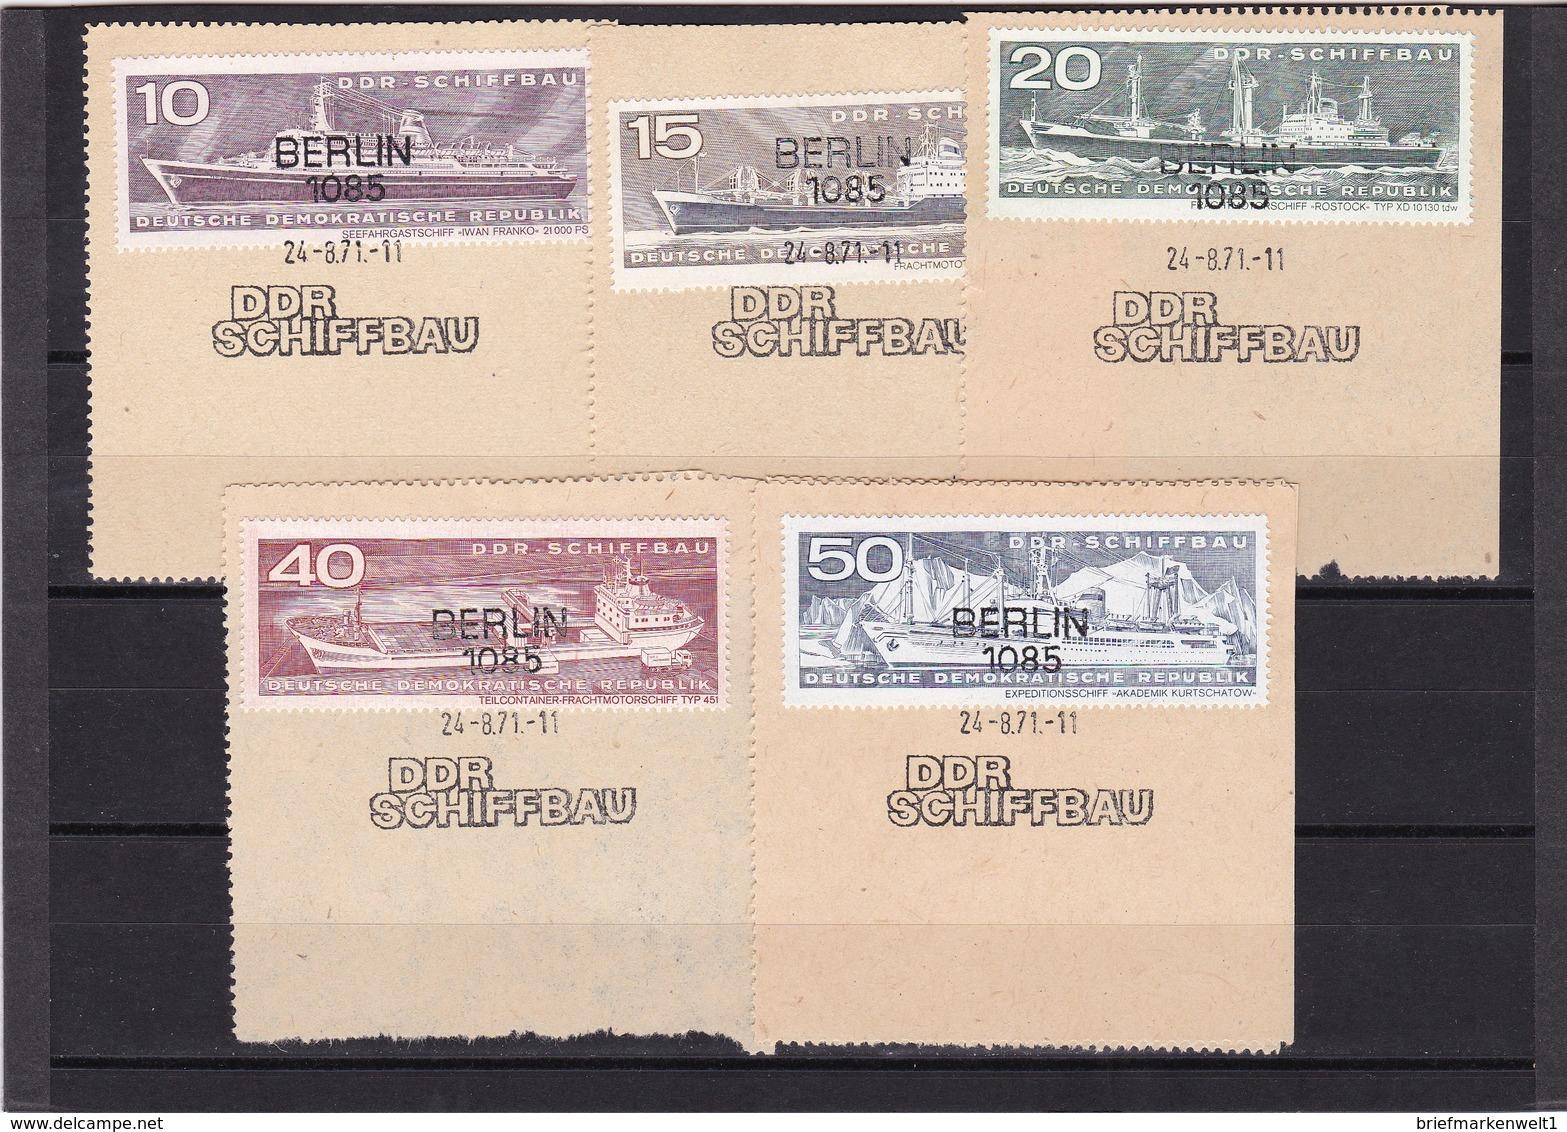 DDR, Nr. 1693/98 SST Auf Briefstück (K 3945) - DDR